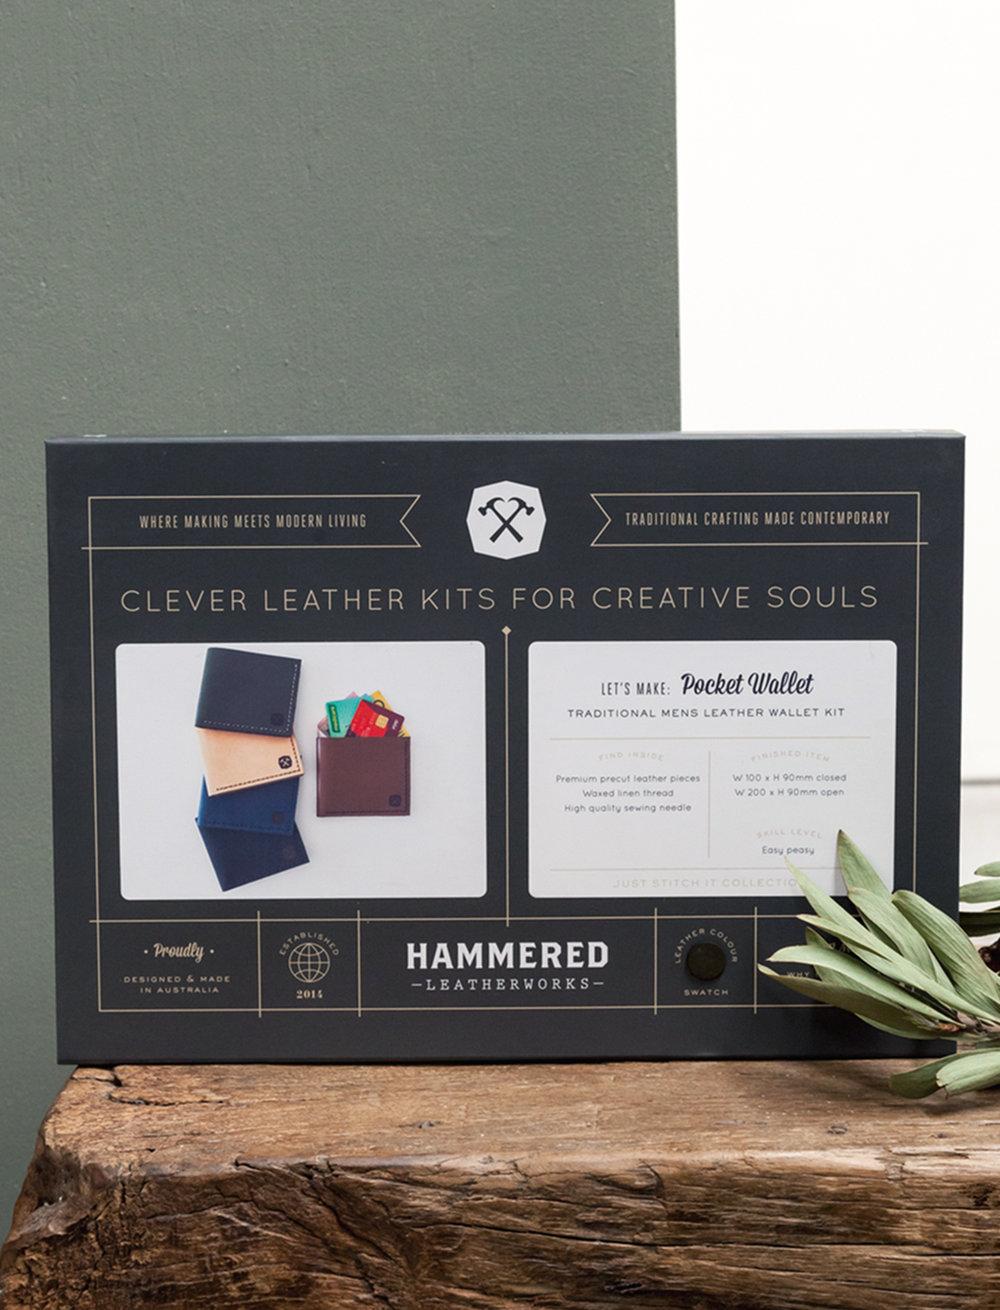 06. hammered-leatherworks.jpg